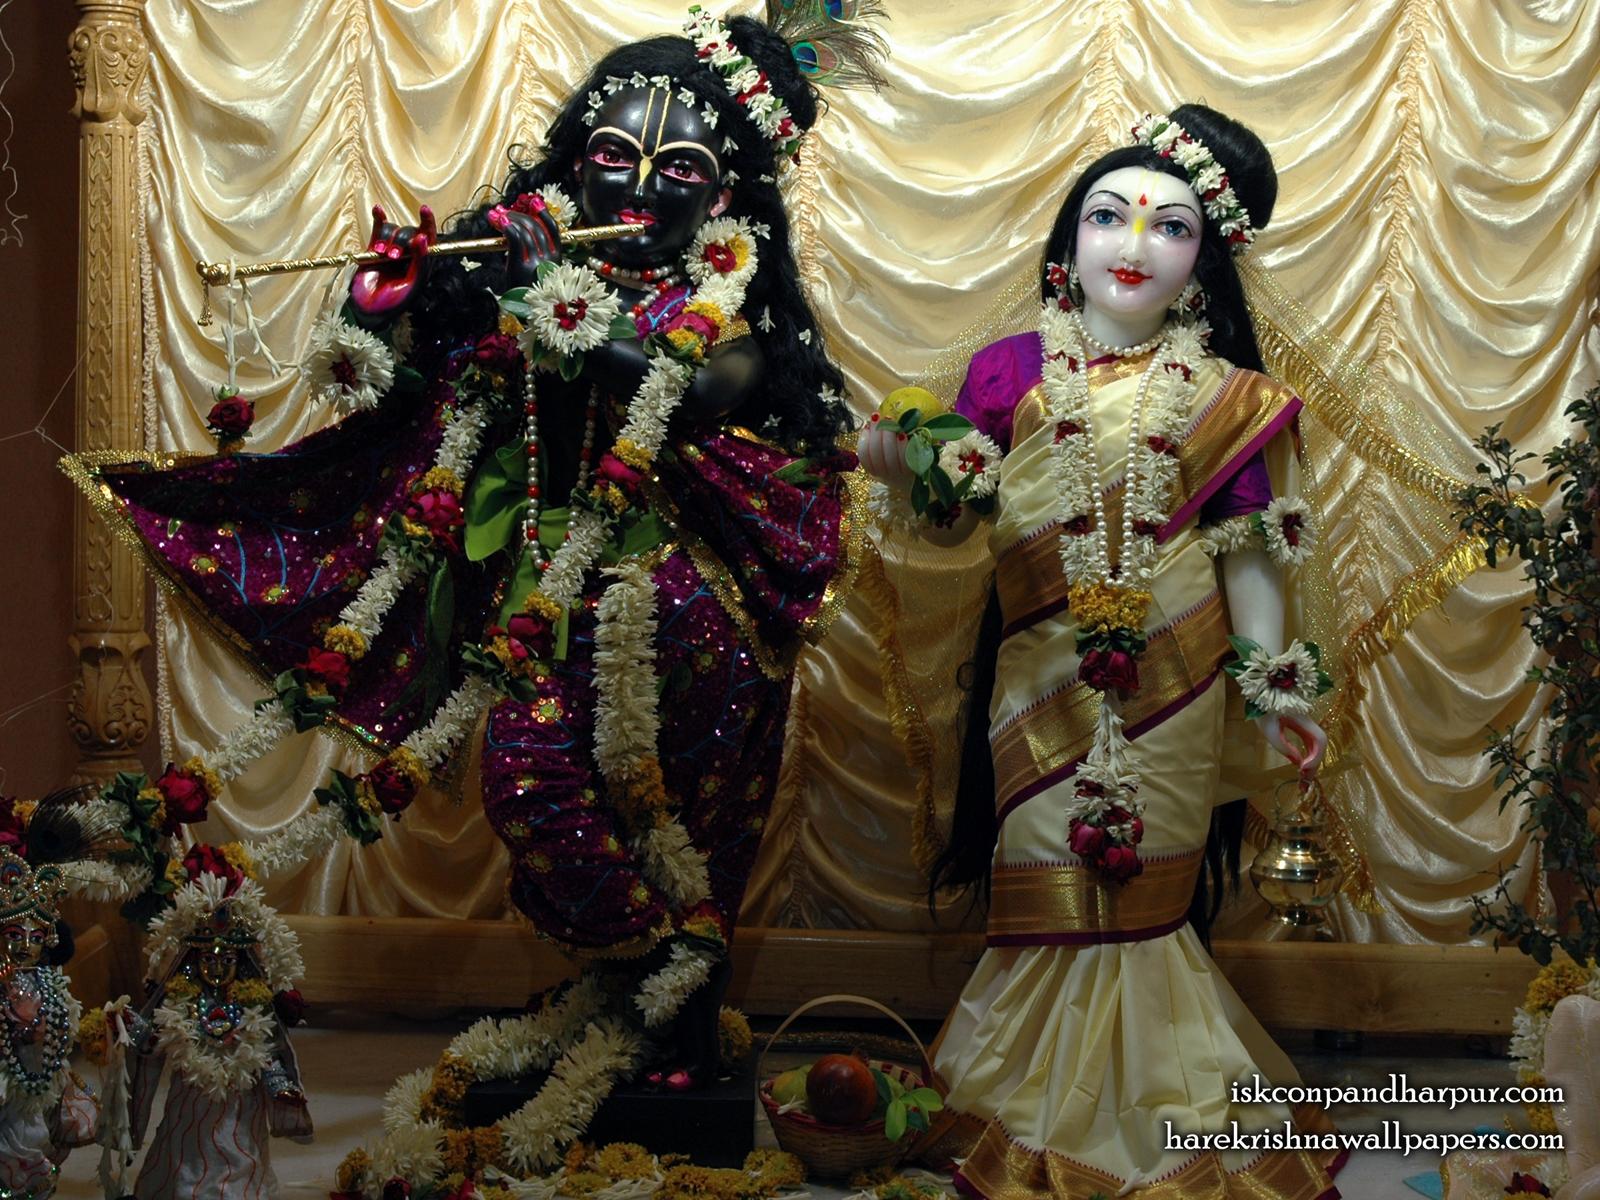 Sri Sri Radha Pandharinath Wallpaper (001) Size1600x1200 Download